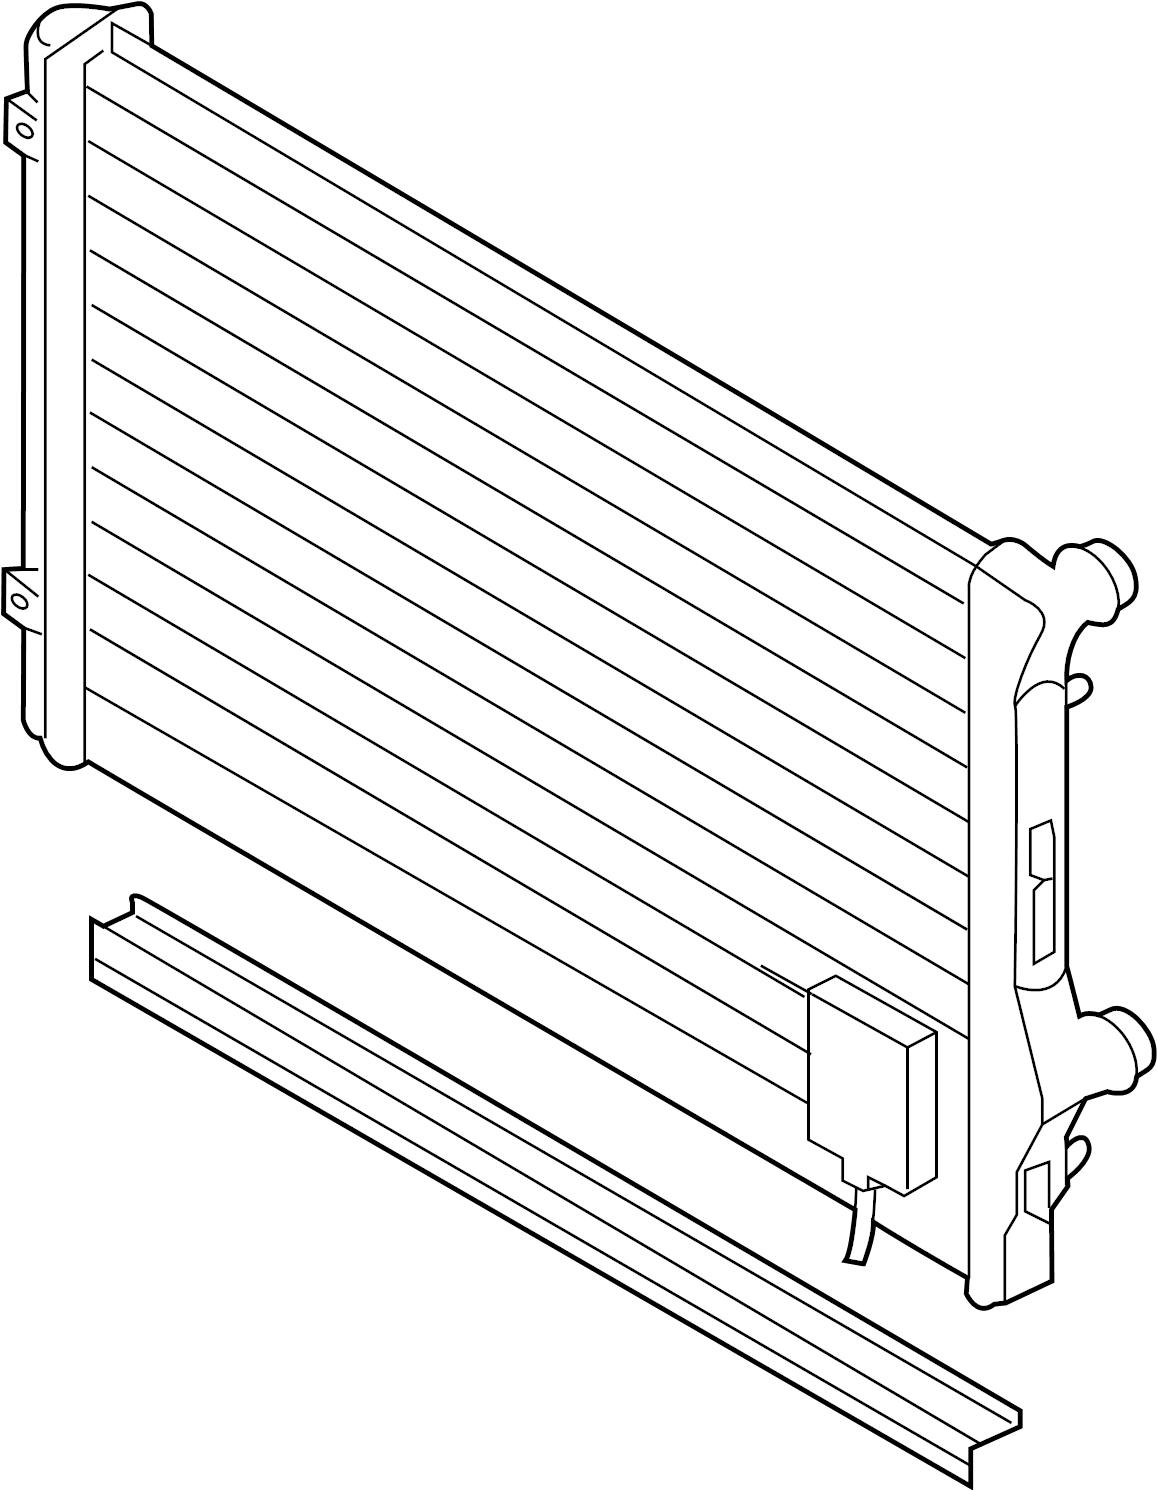 2013 volkswagen jetta gli radiator assembly  650 x 454mm